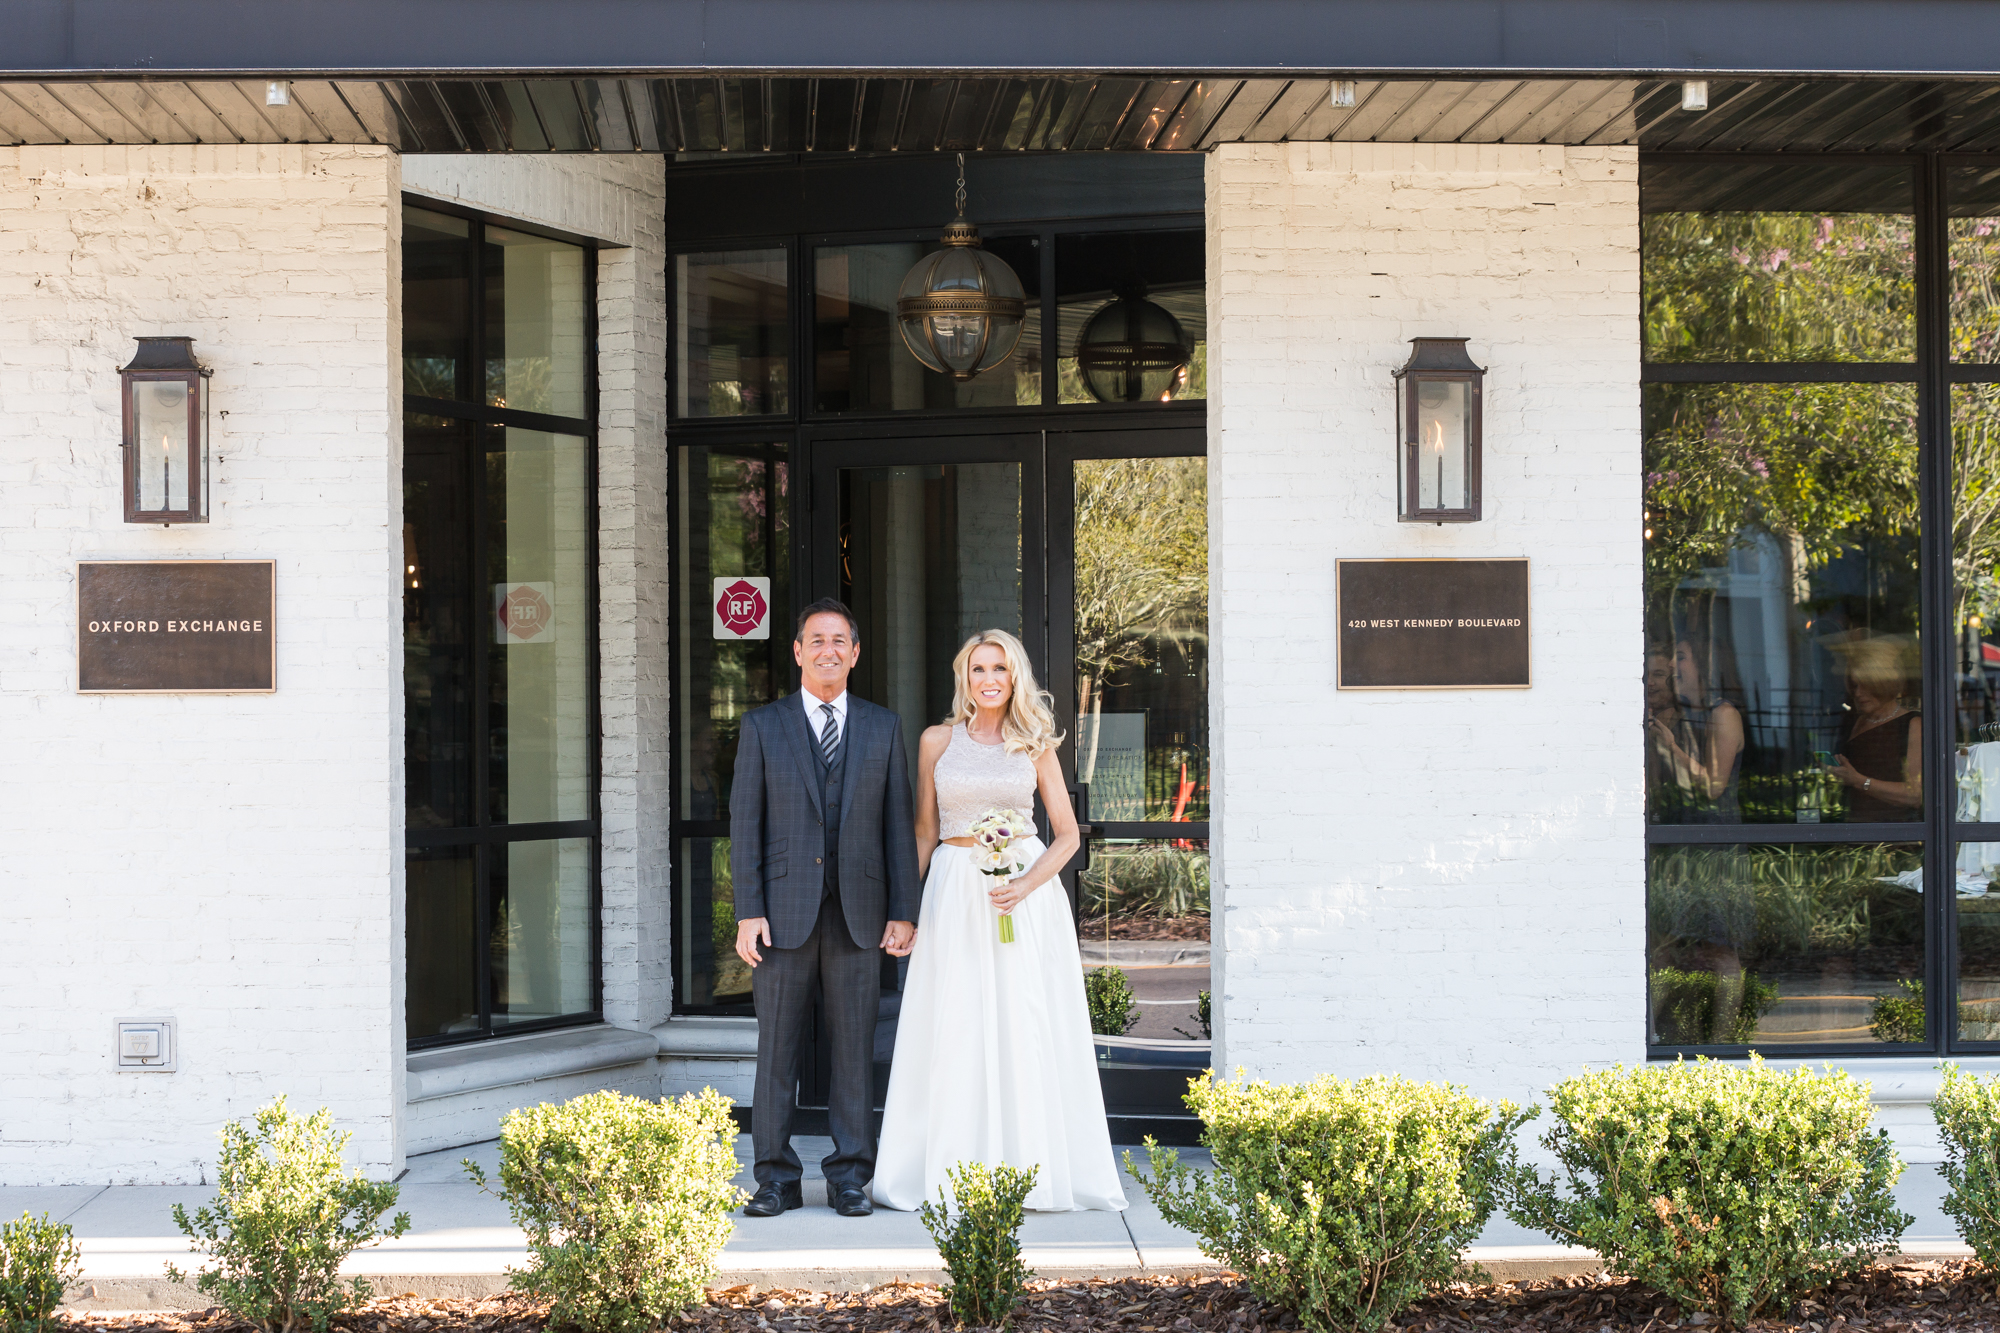 Oxford-Exchange-wedding, Tampa-wedding